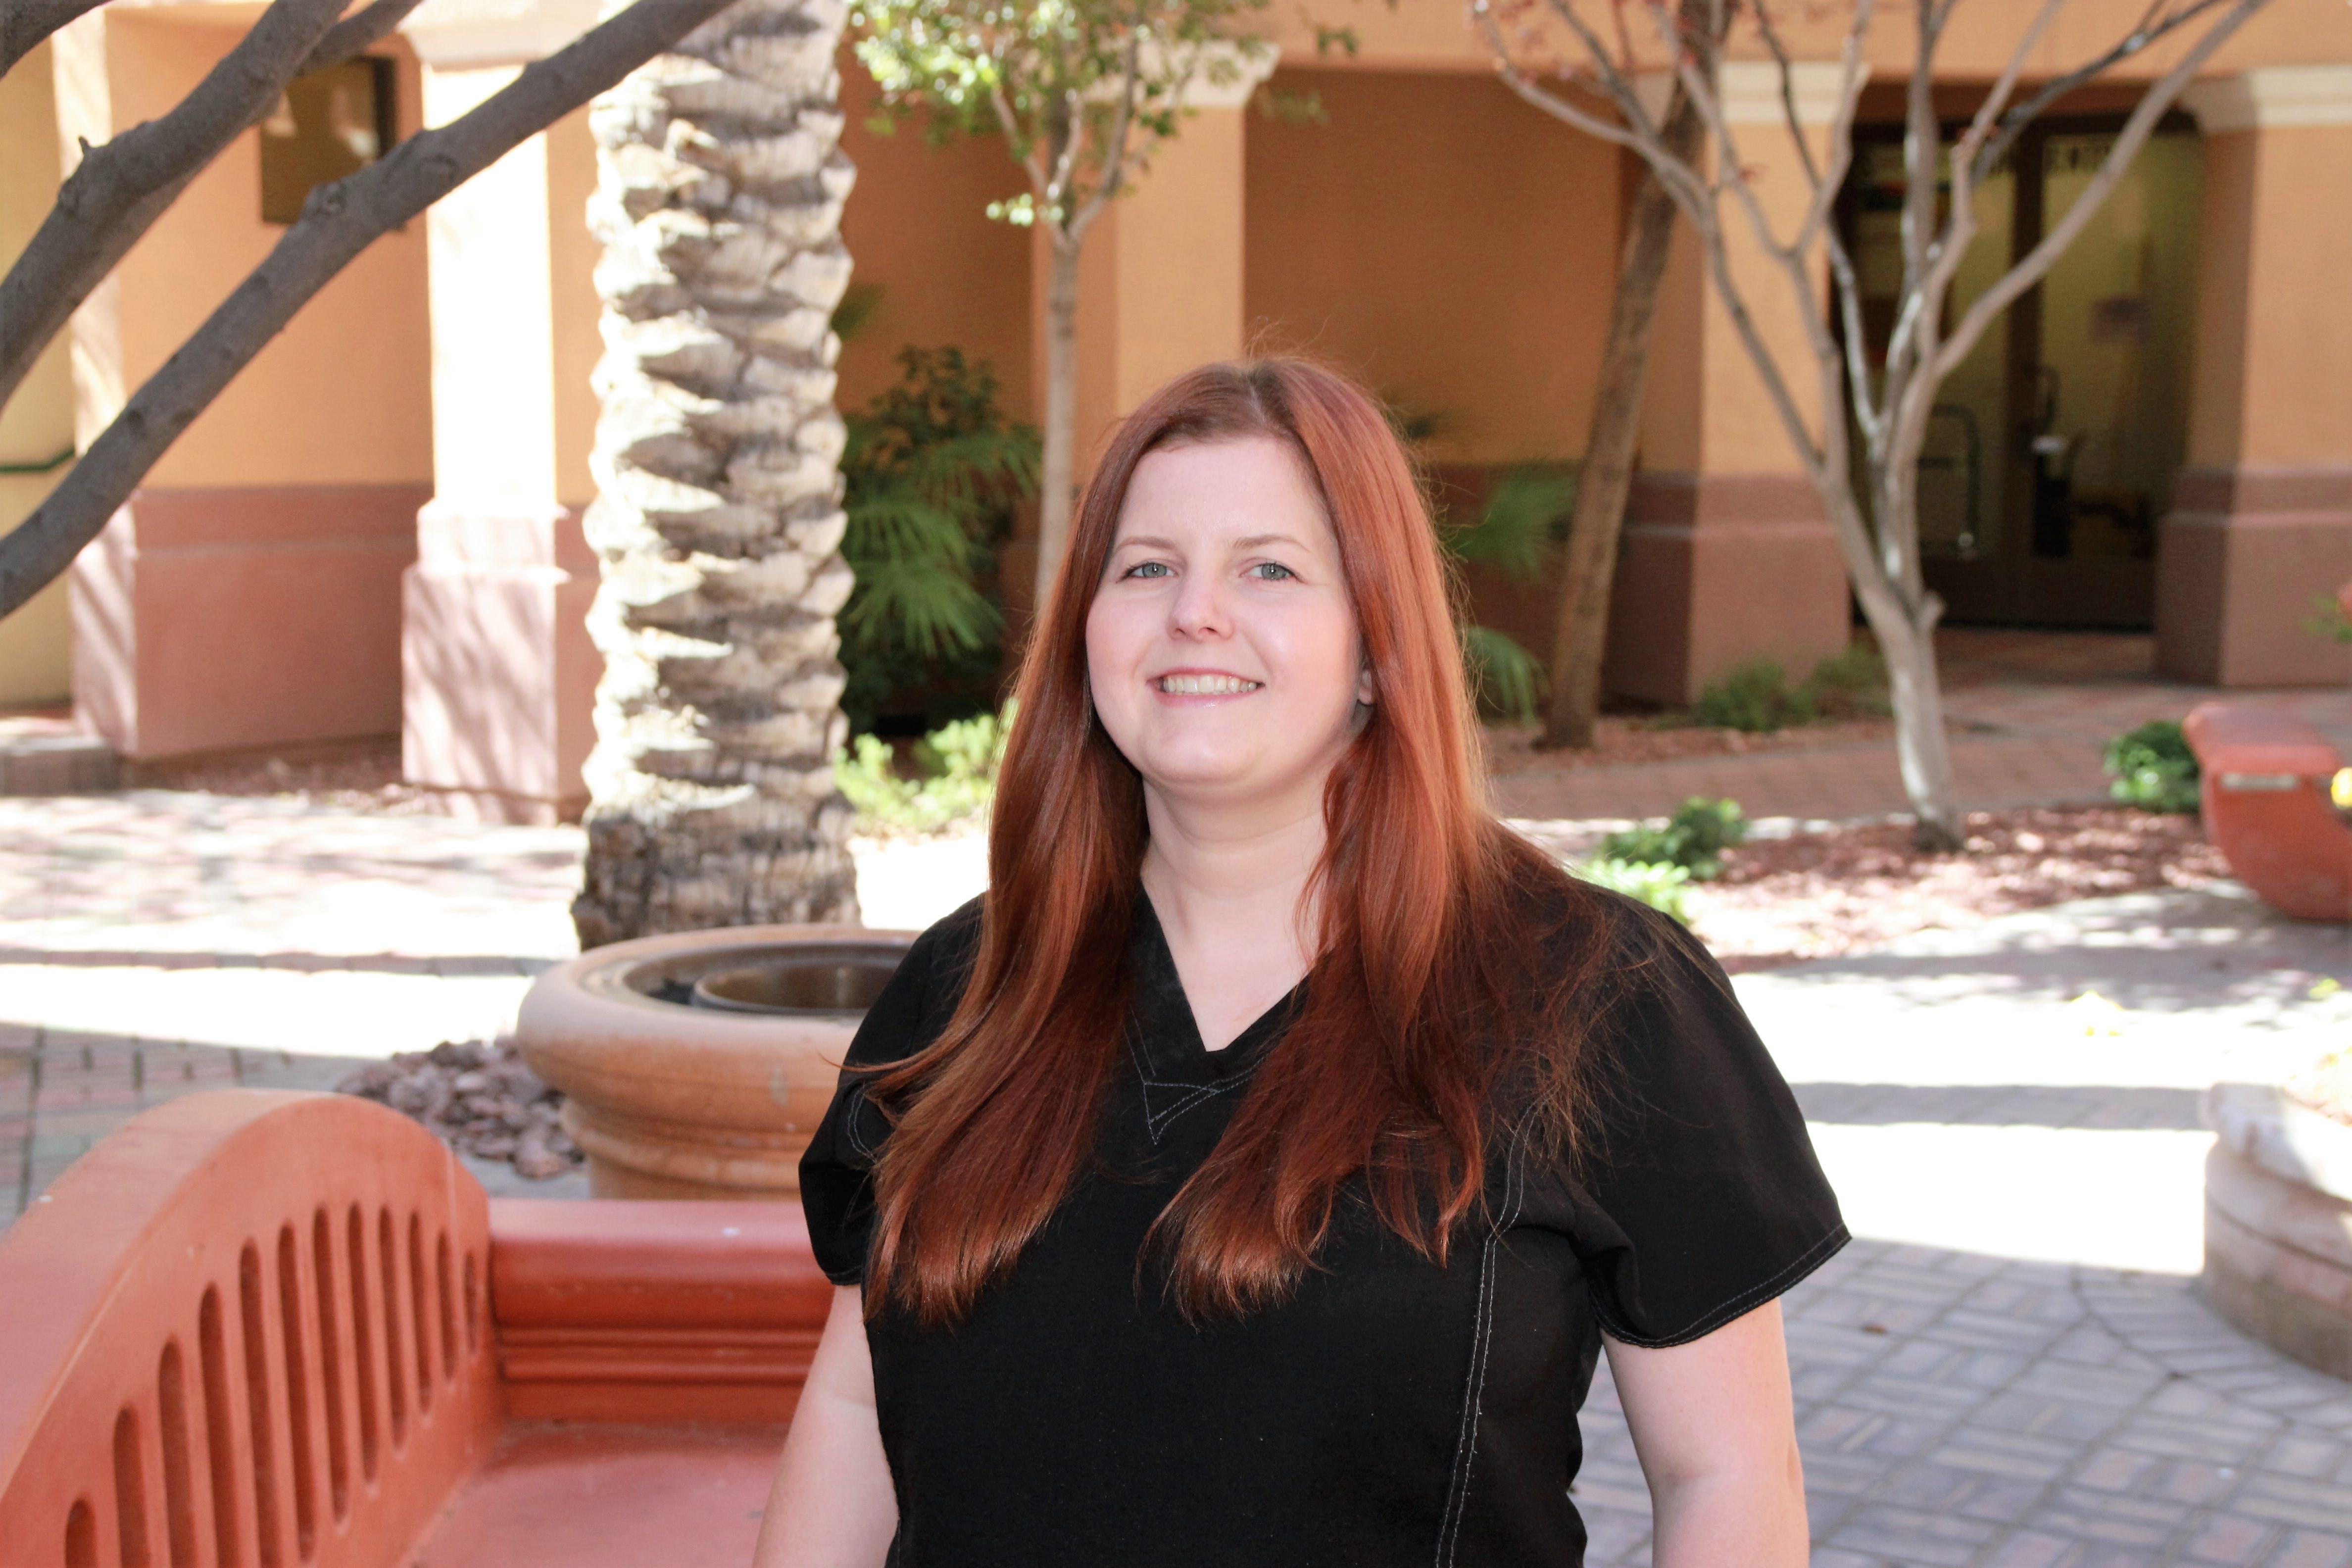 Karinne Crook, Technician